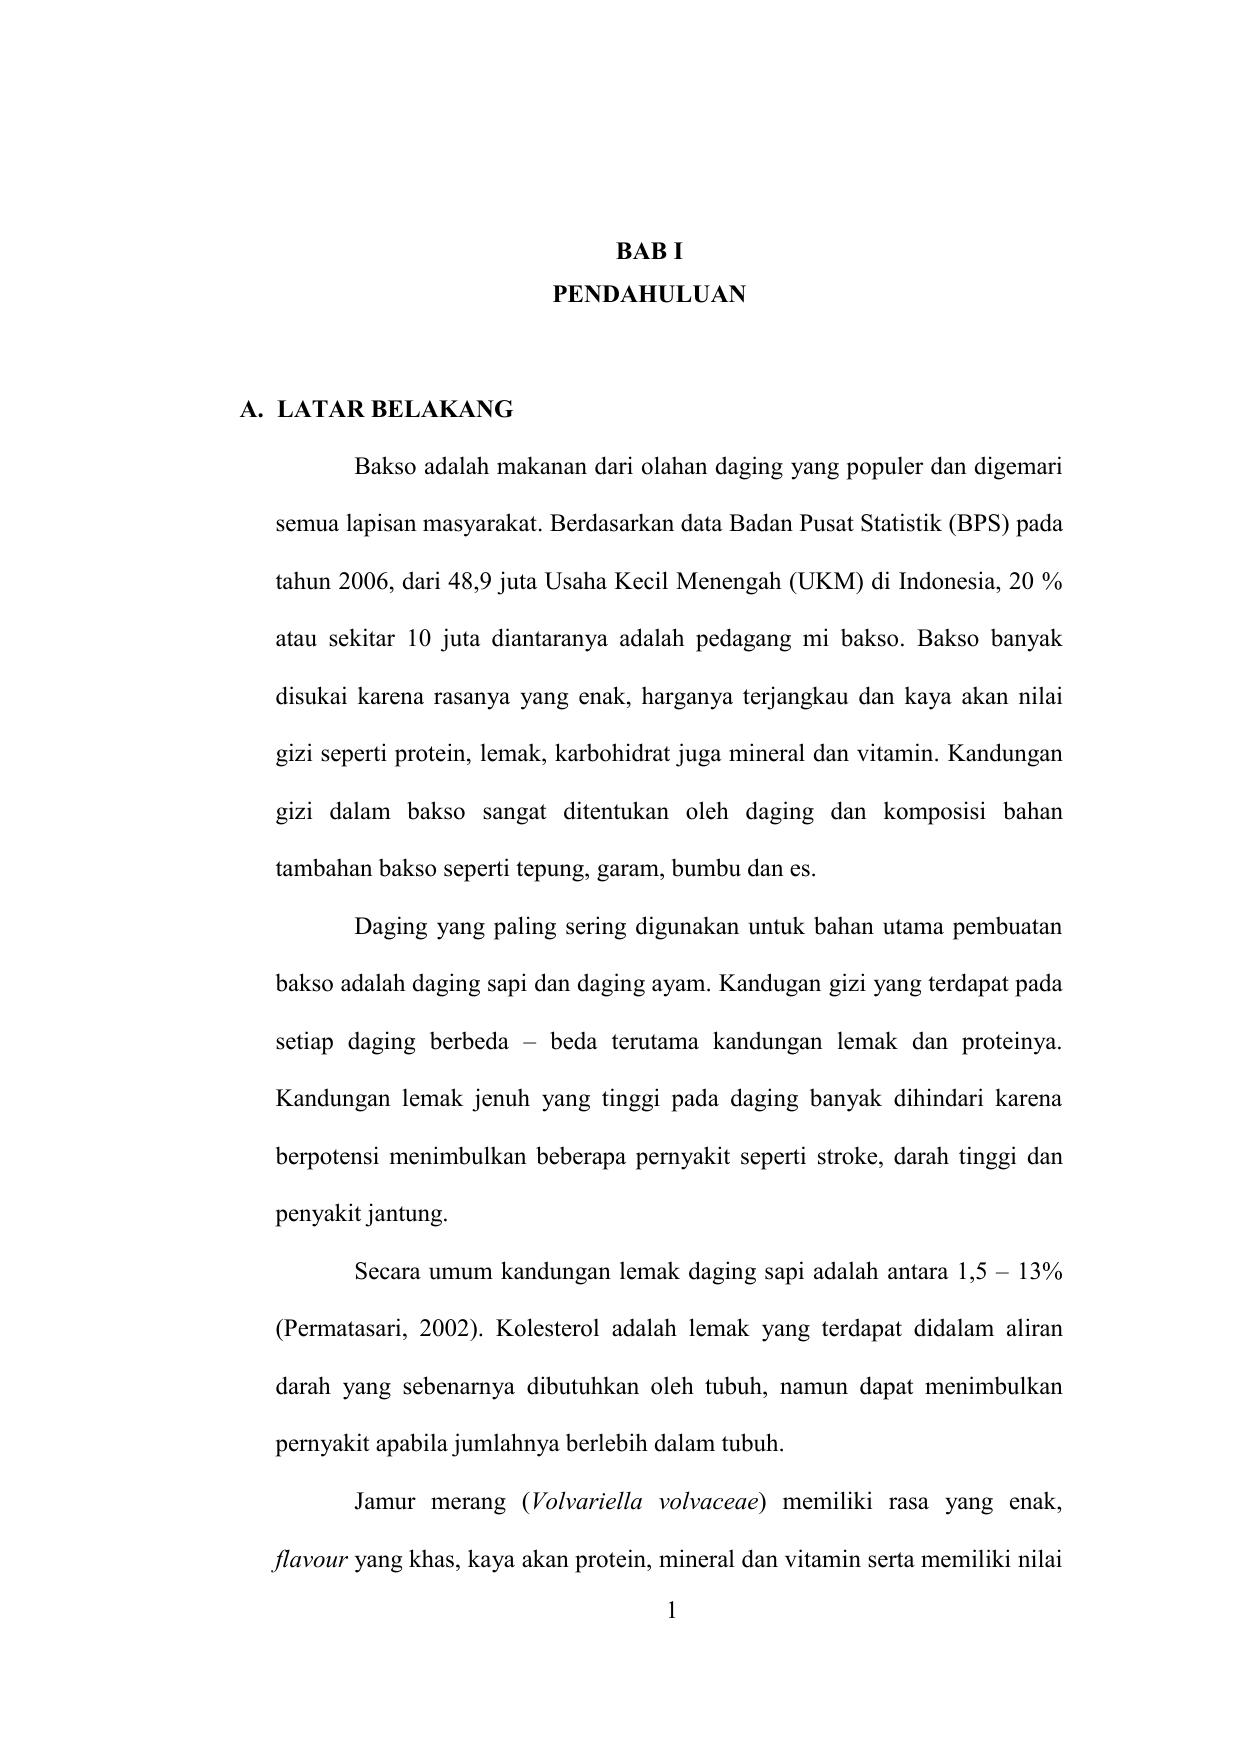 Contoh Bab 1 Pendahuluan Skripsi Ide Judul Skripsi Universitas